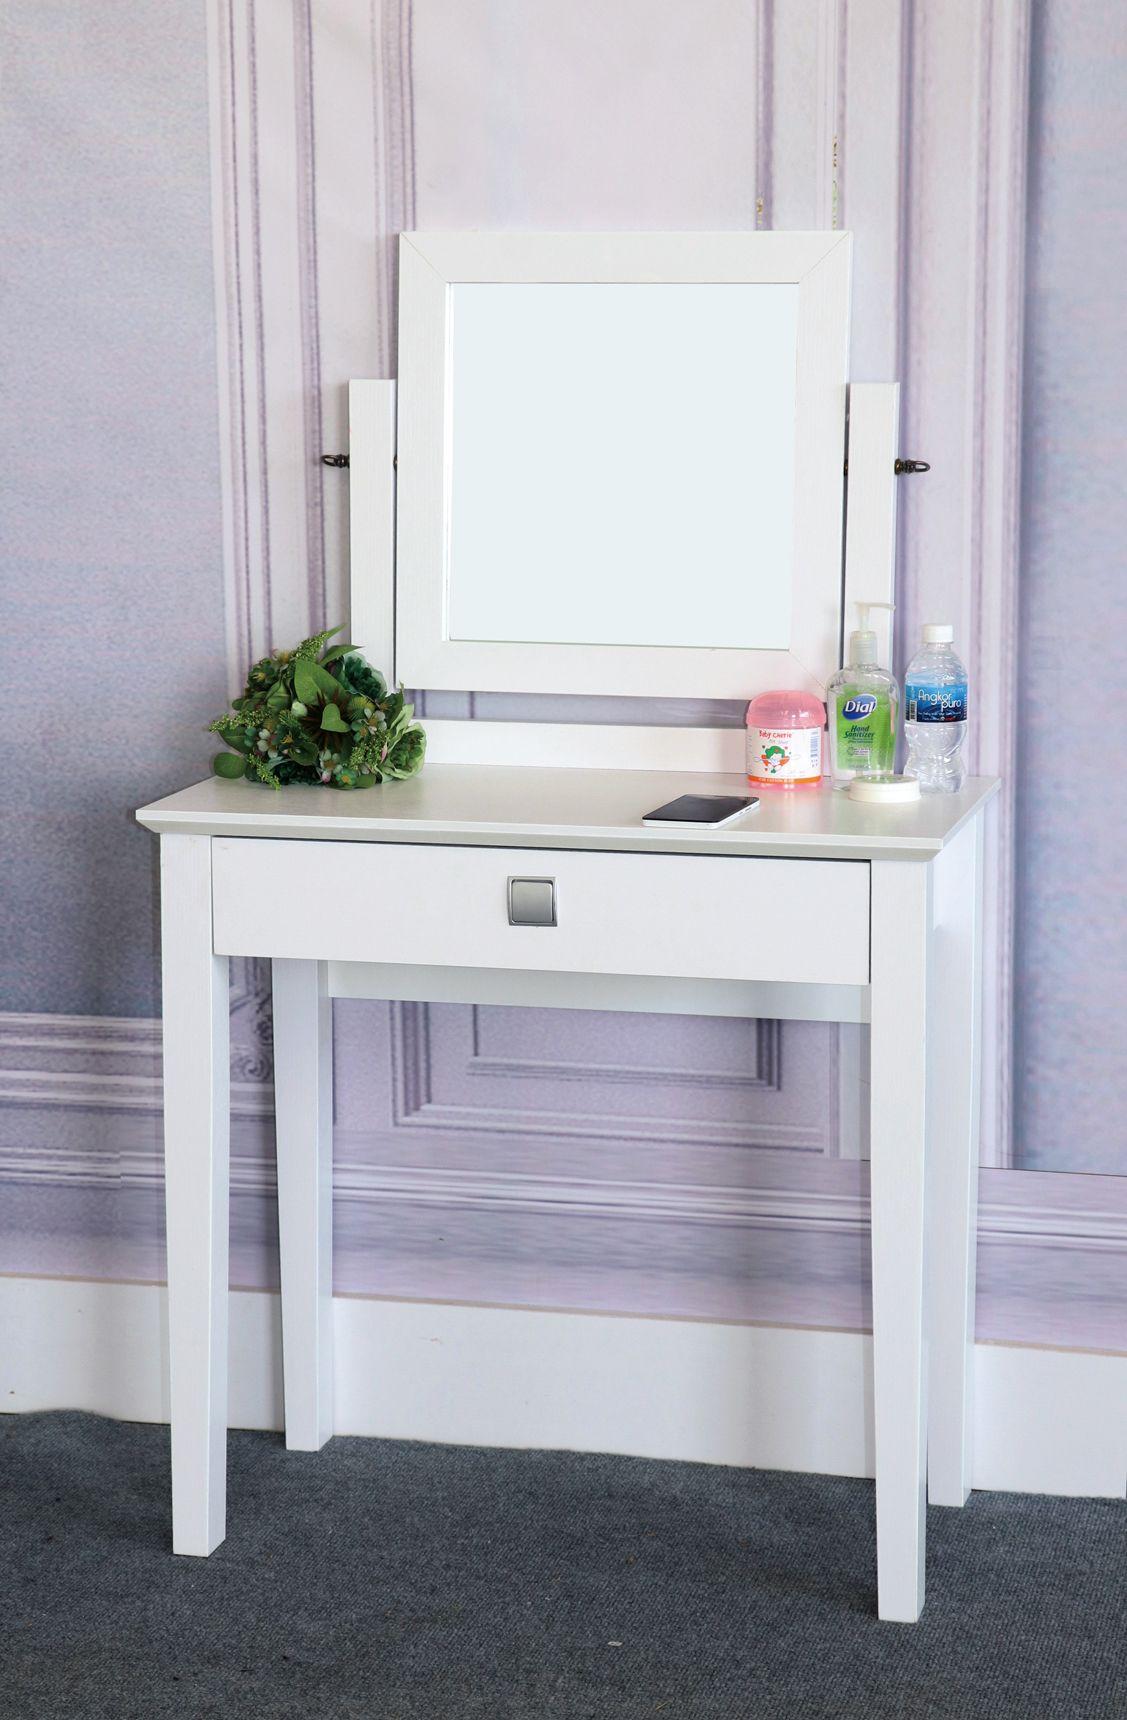 K16031 Smart Home Vanity Table Make Up Jewelry Mirror